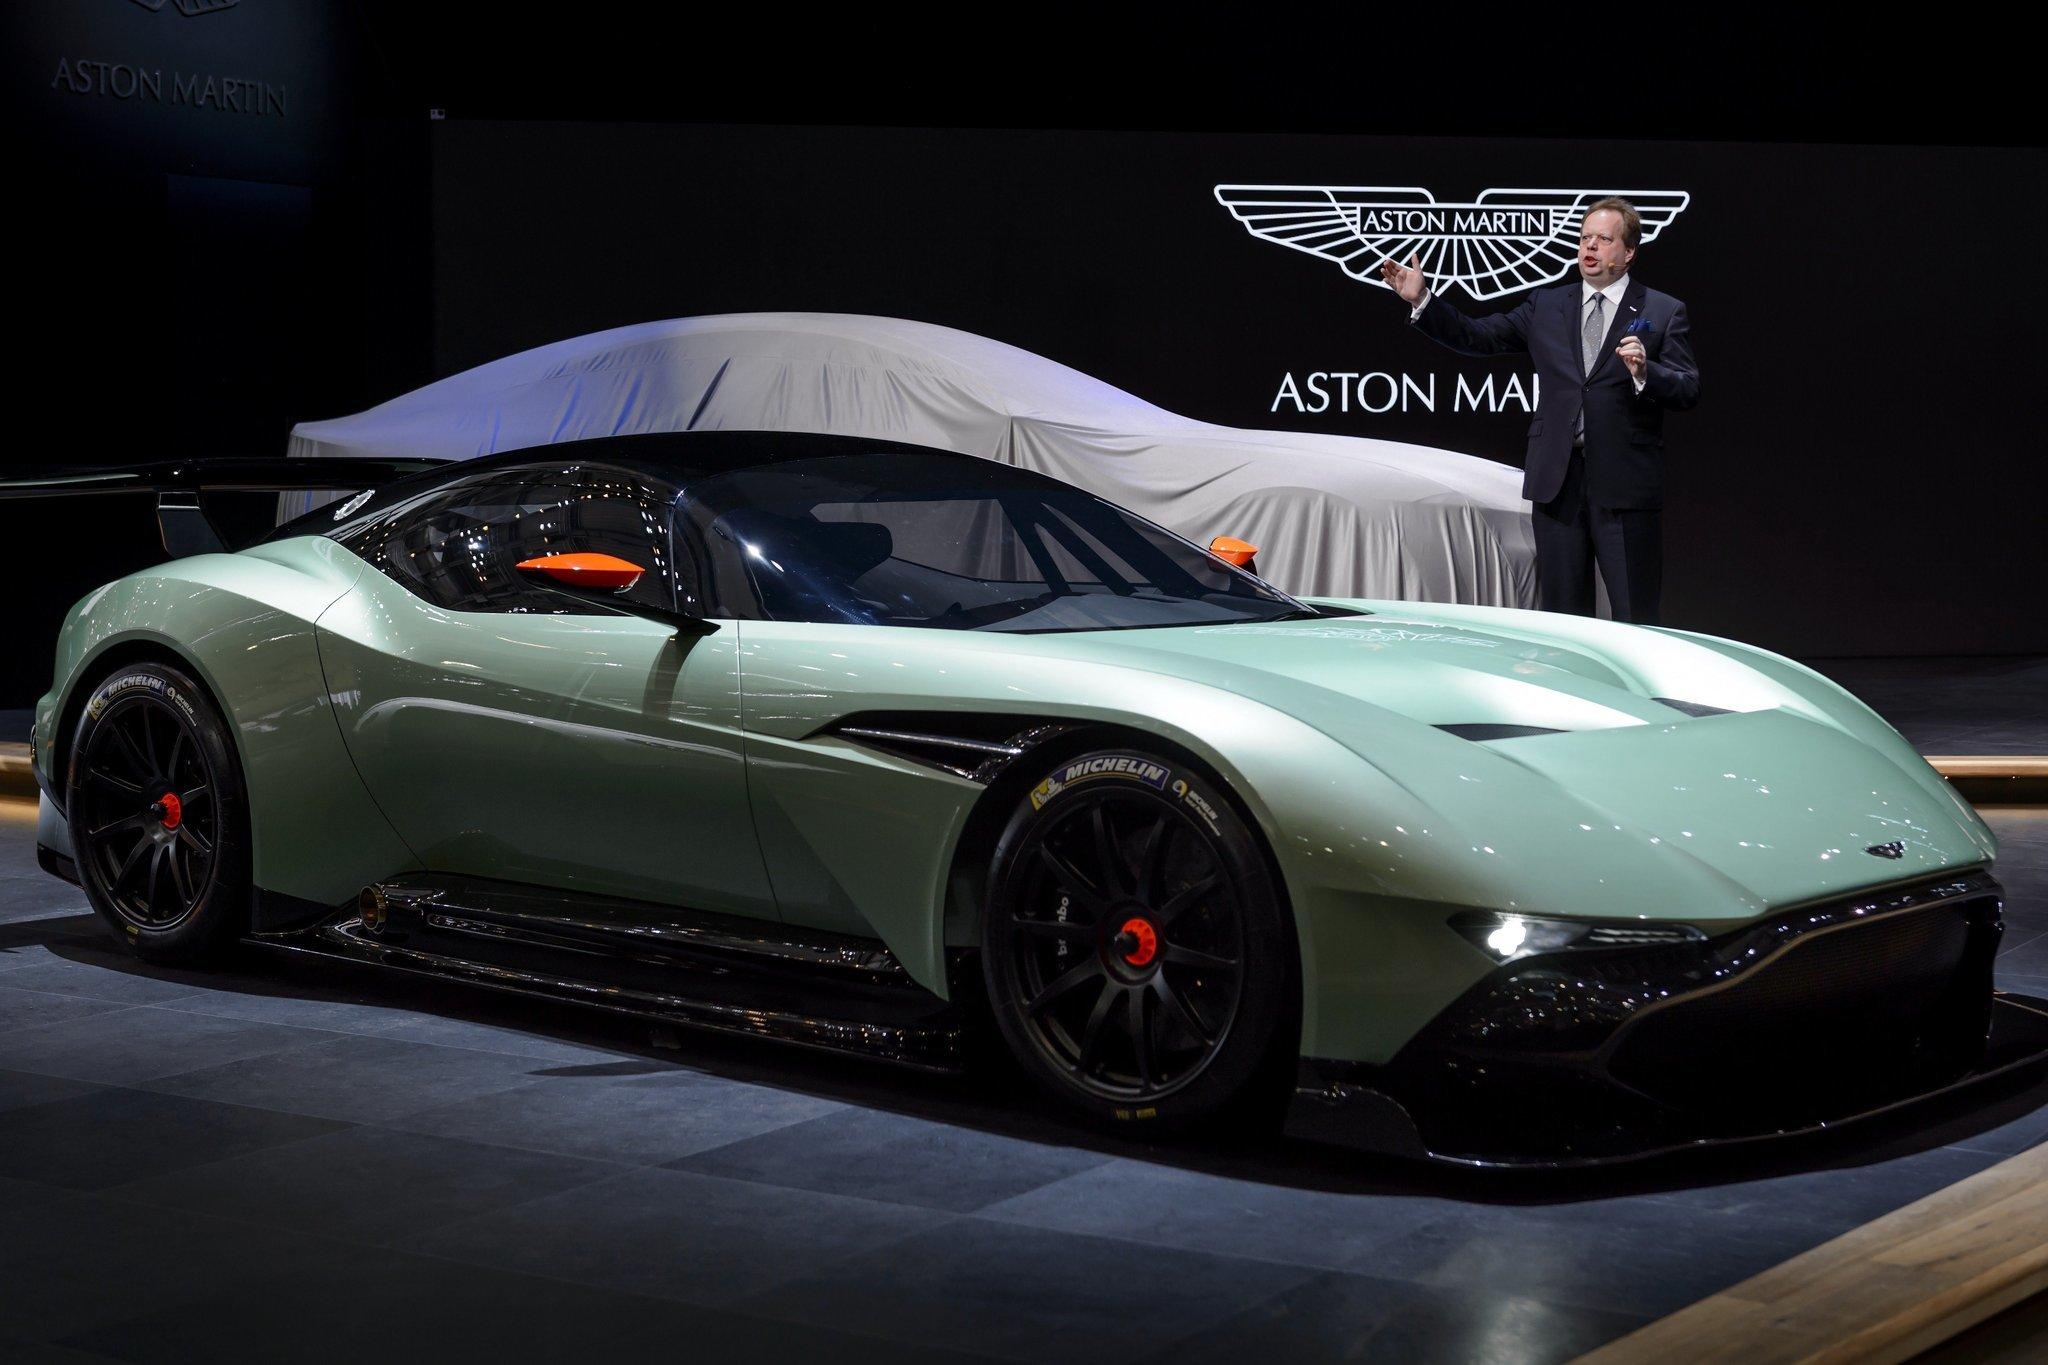 2015 Geneva Motor Show: Aston Martin Debuts Track-only